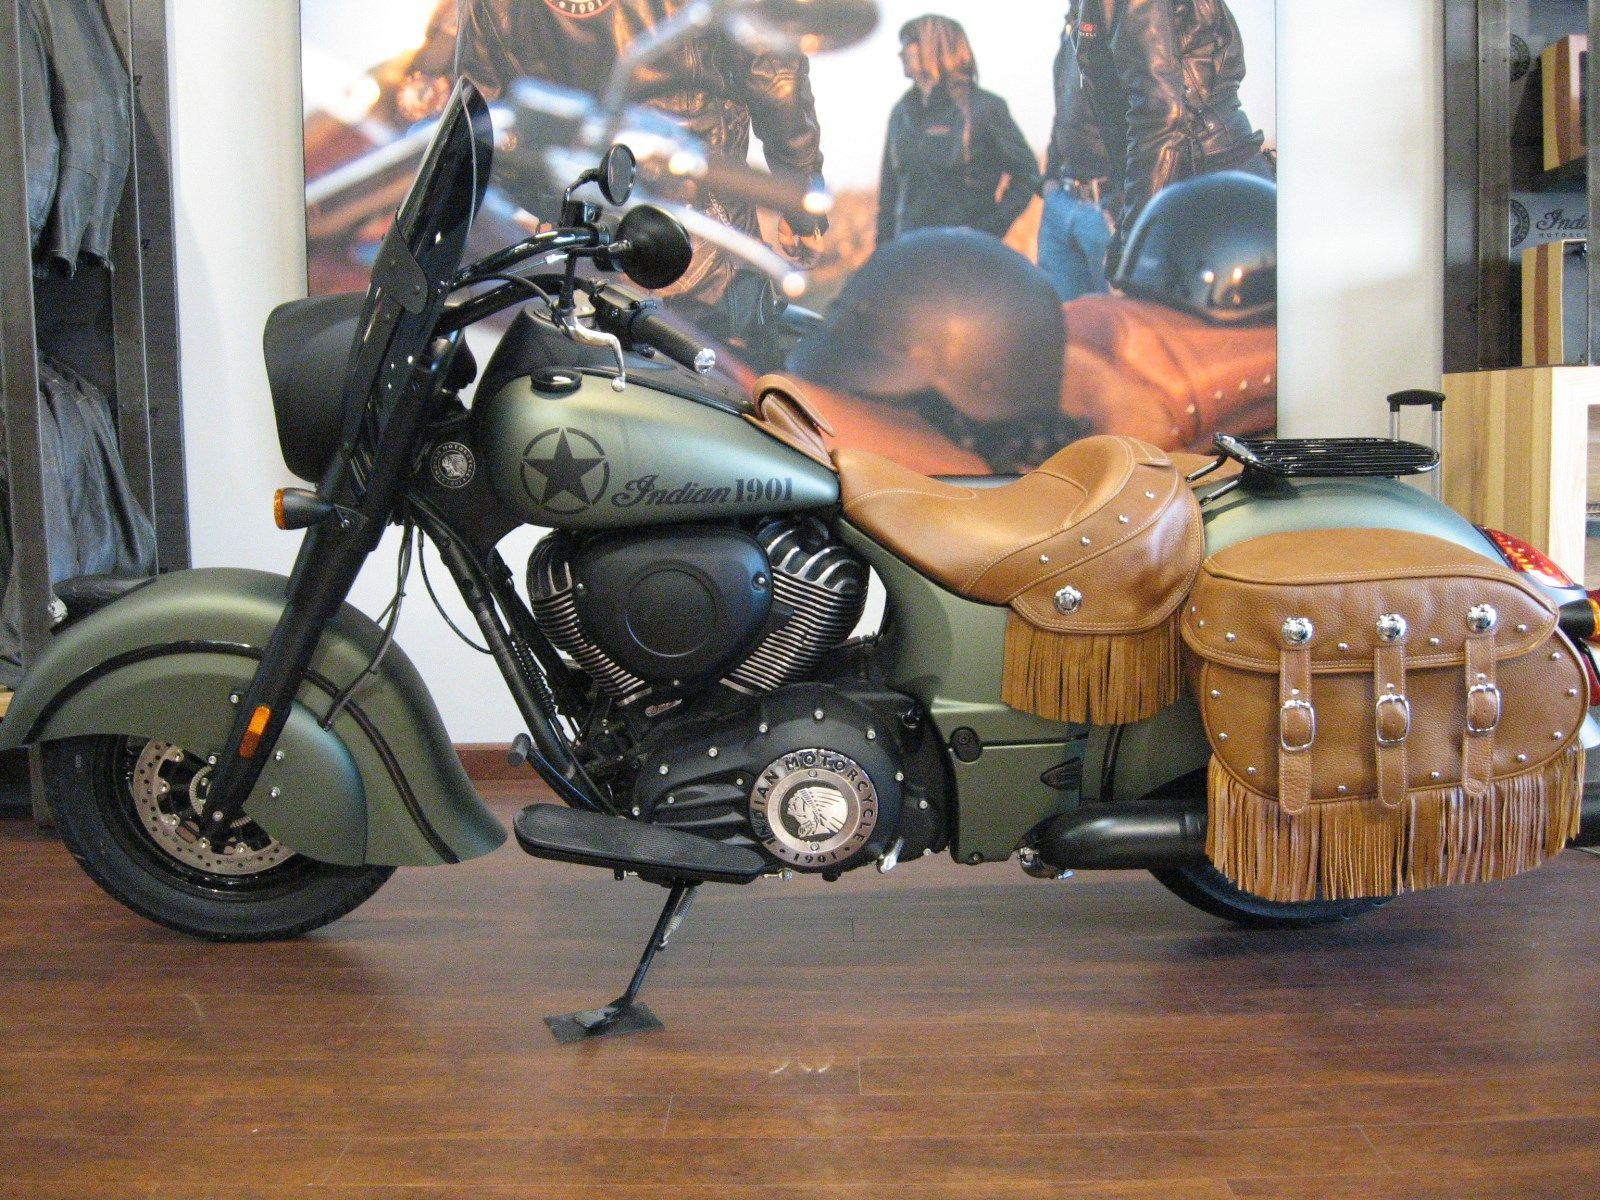 Meet indian motorcycles first model of 2016 indian chief dark - 2016 Indian Chief Dark Horse In Chesapeake Virginia